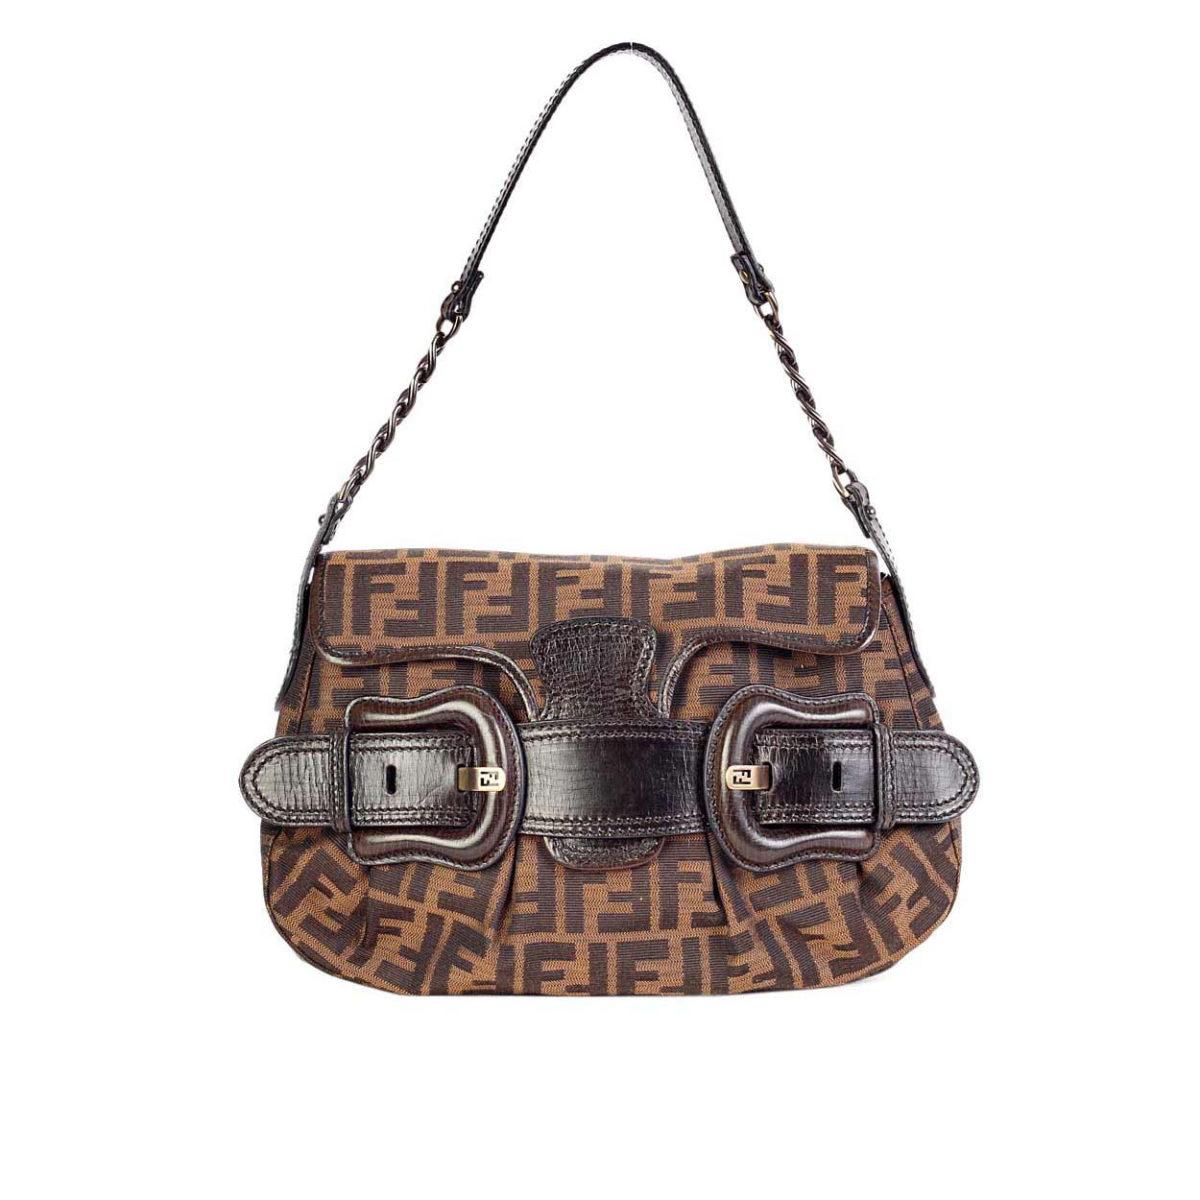 046e7d5fc3a4 FENDI Zucca Buckle Handbag